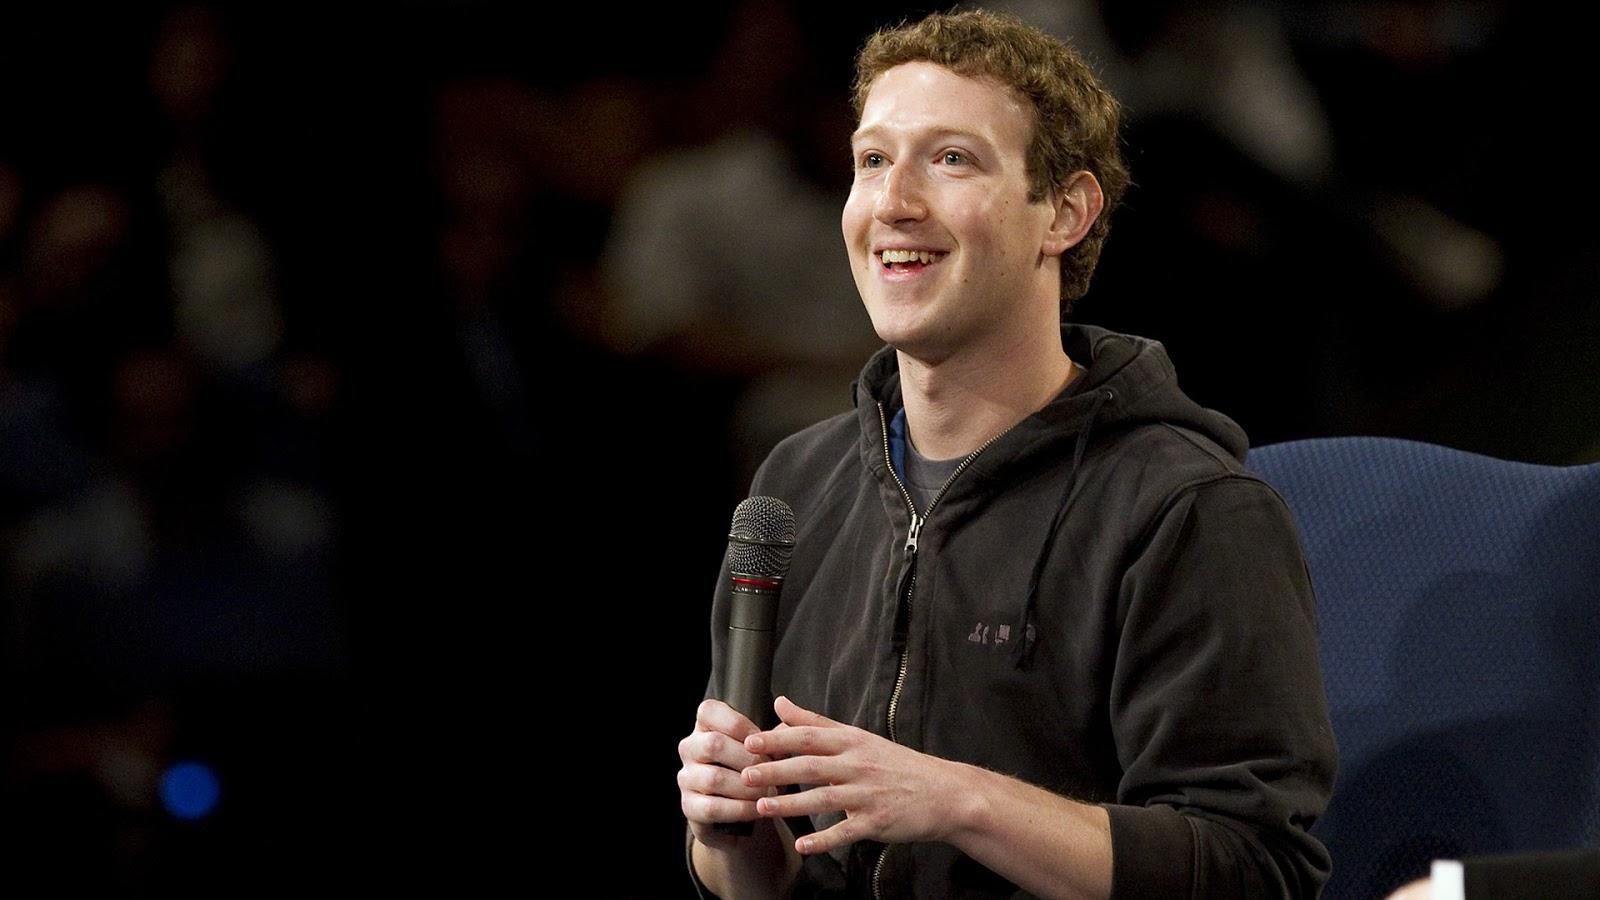 download image mark zuckerberg - photo #4